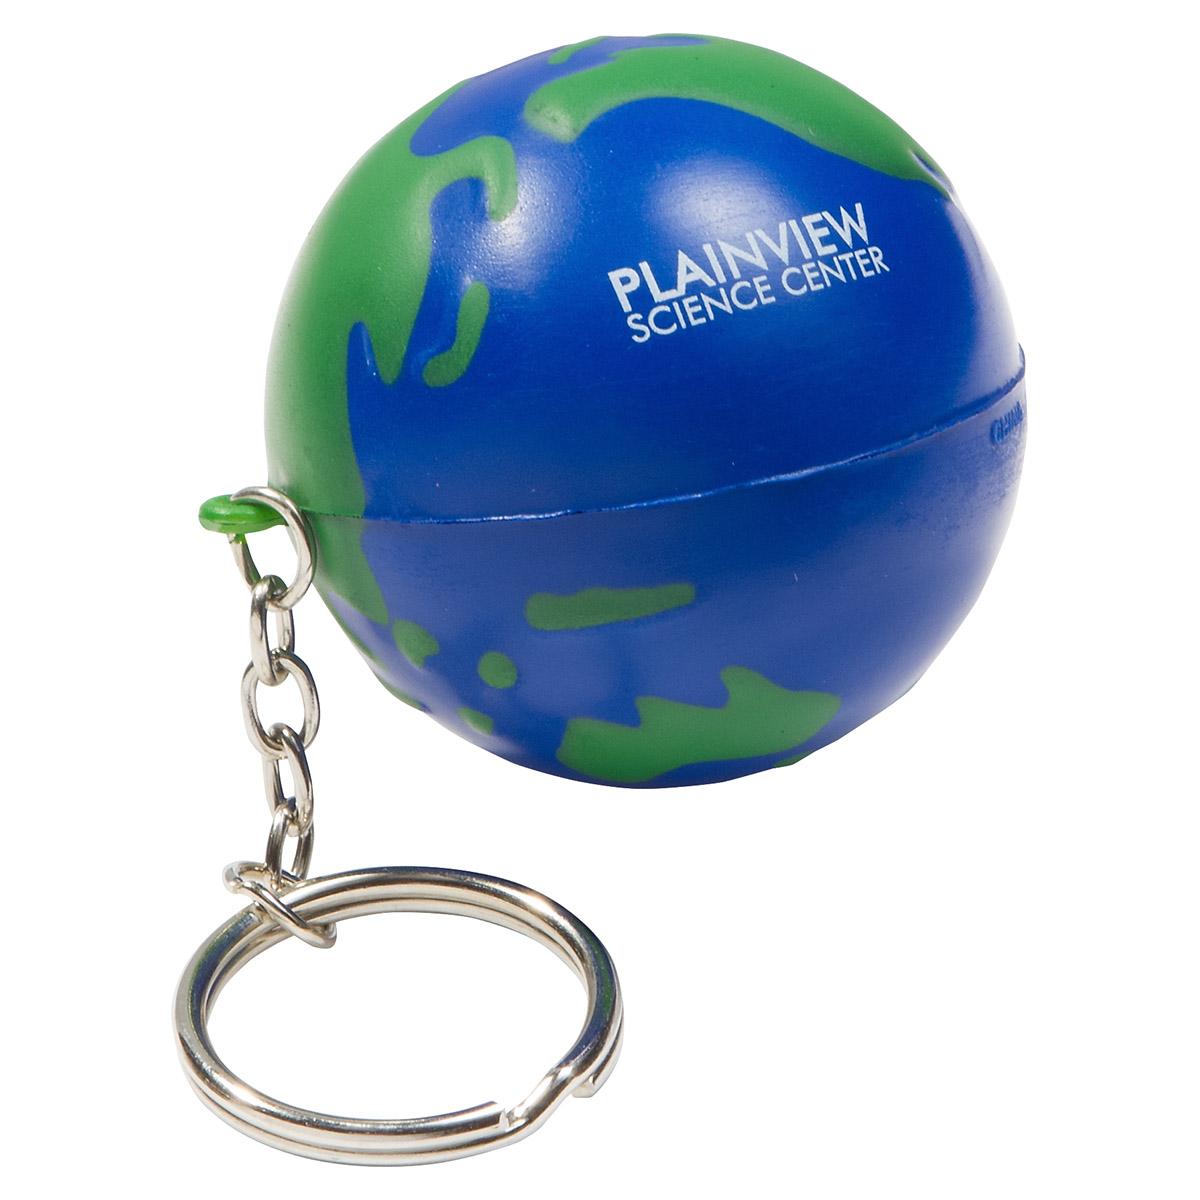 Earthball Stress Reliever Key Chain, LKC-EB01, 1 Colour Imprint